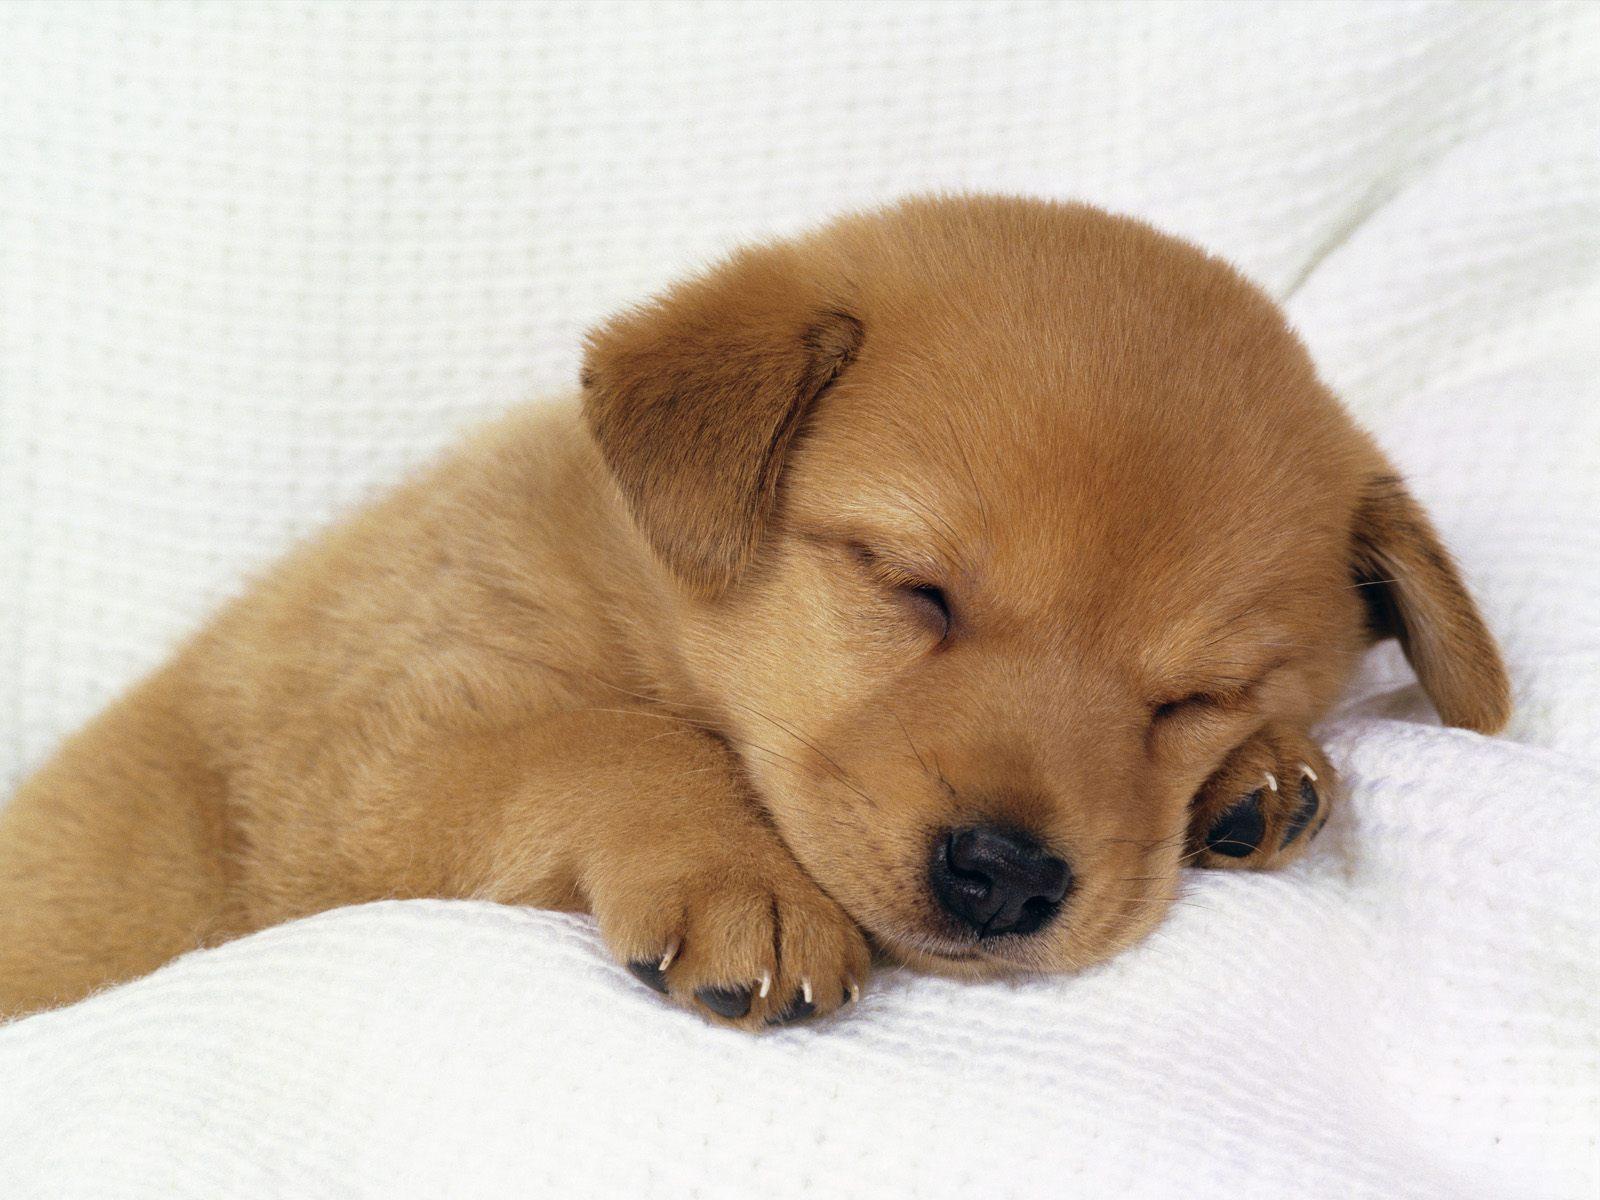 Sleeping dogy